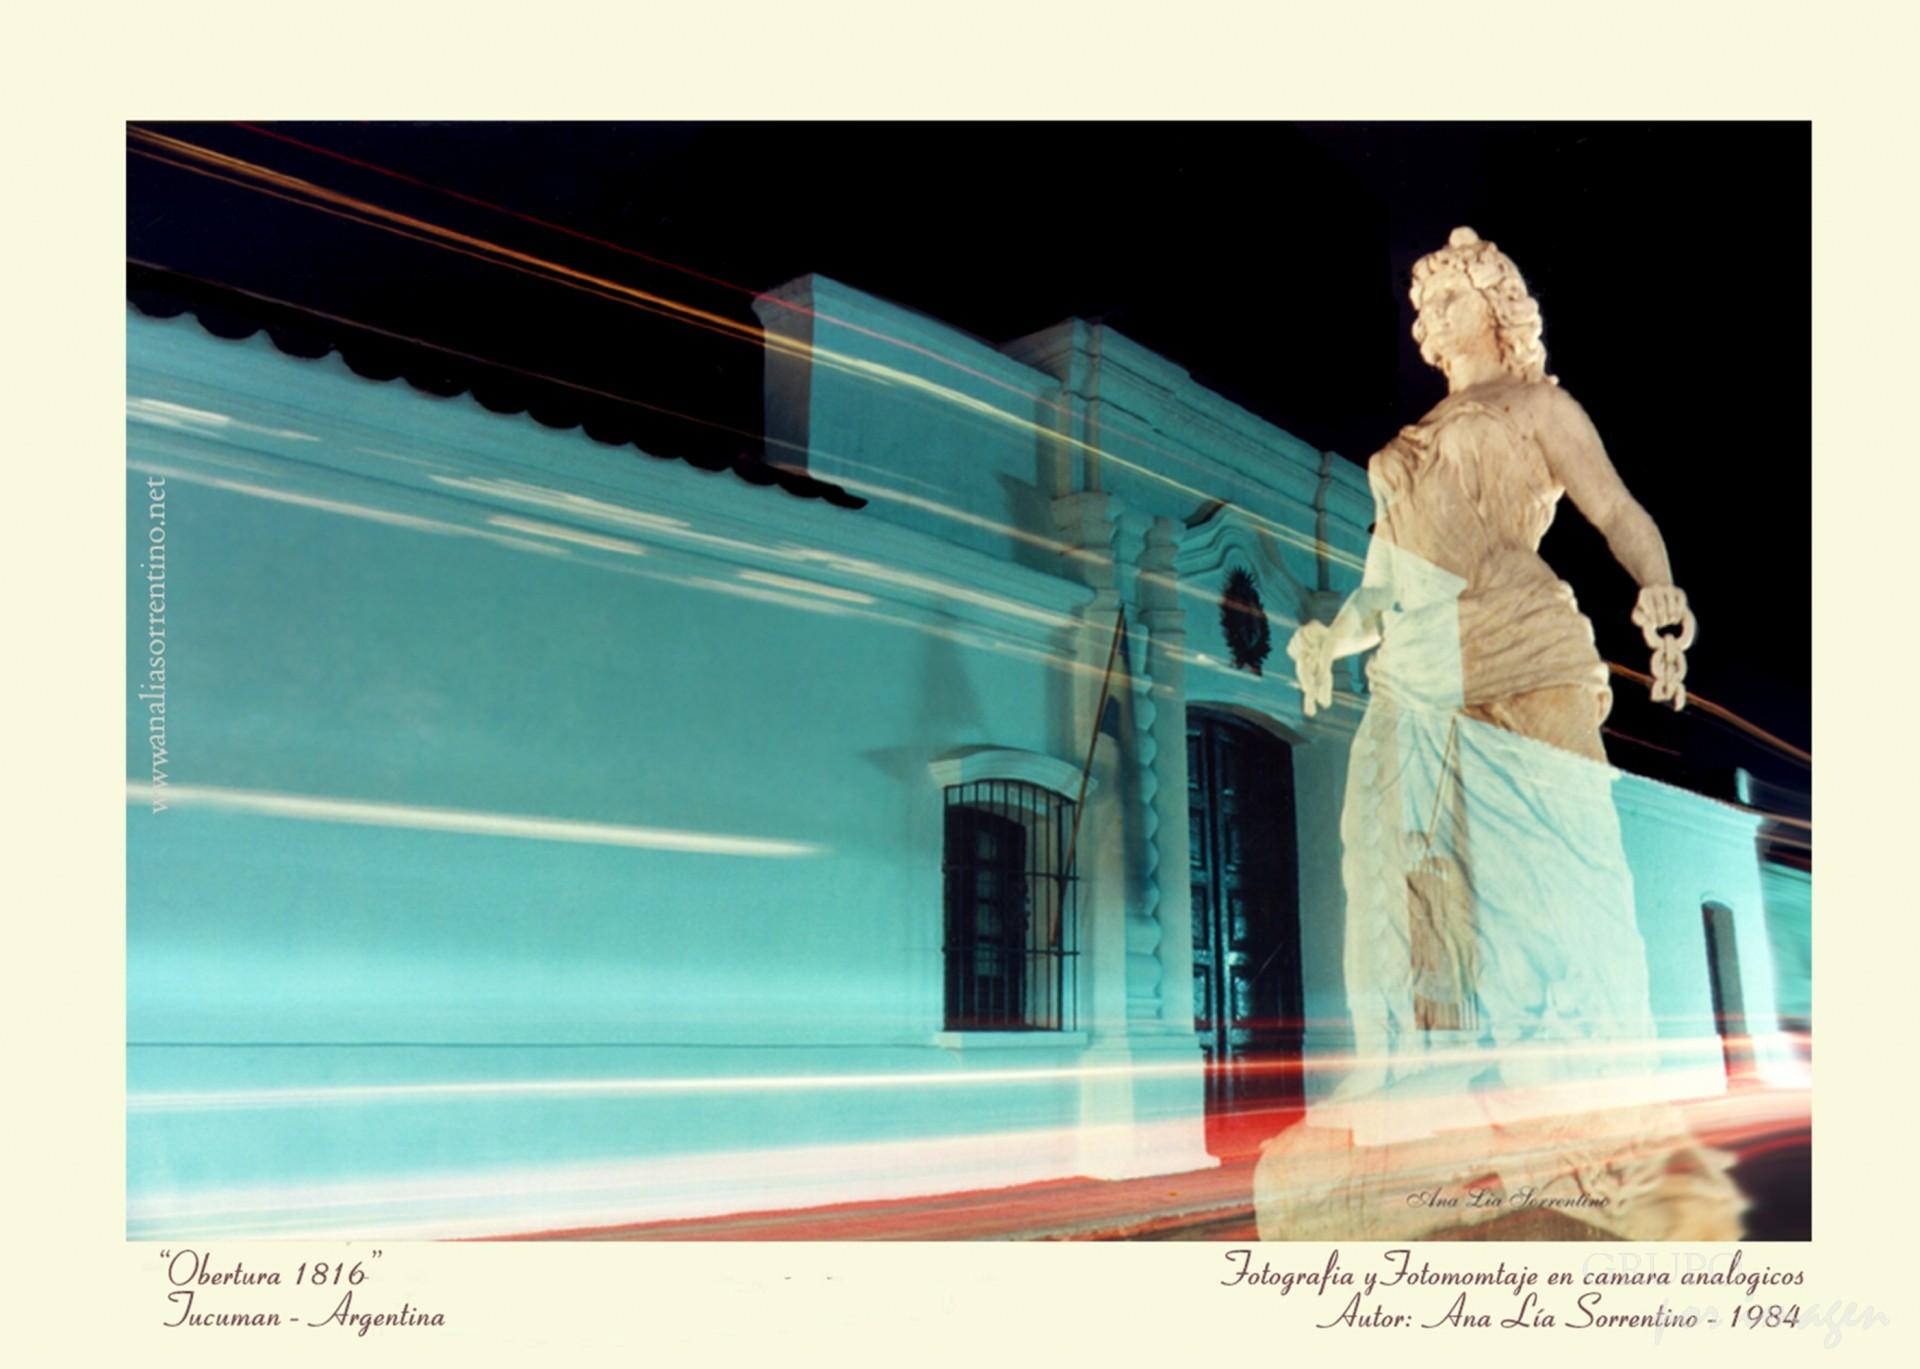 Arte Correo: Obertura 1816 / Ana Lía Sorrentino